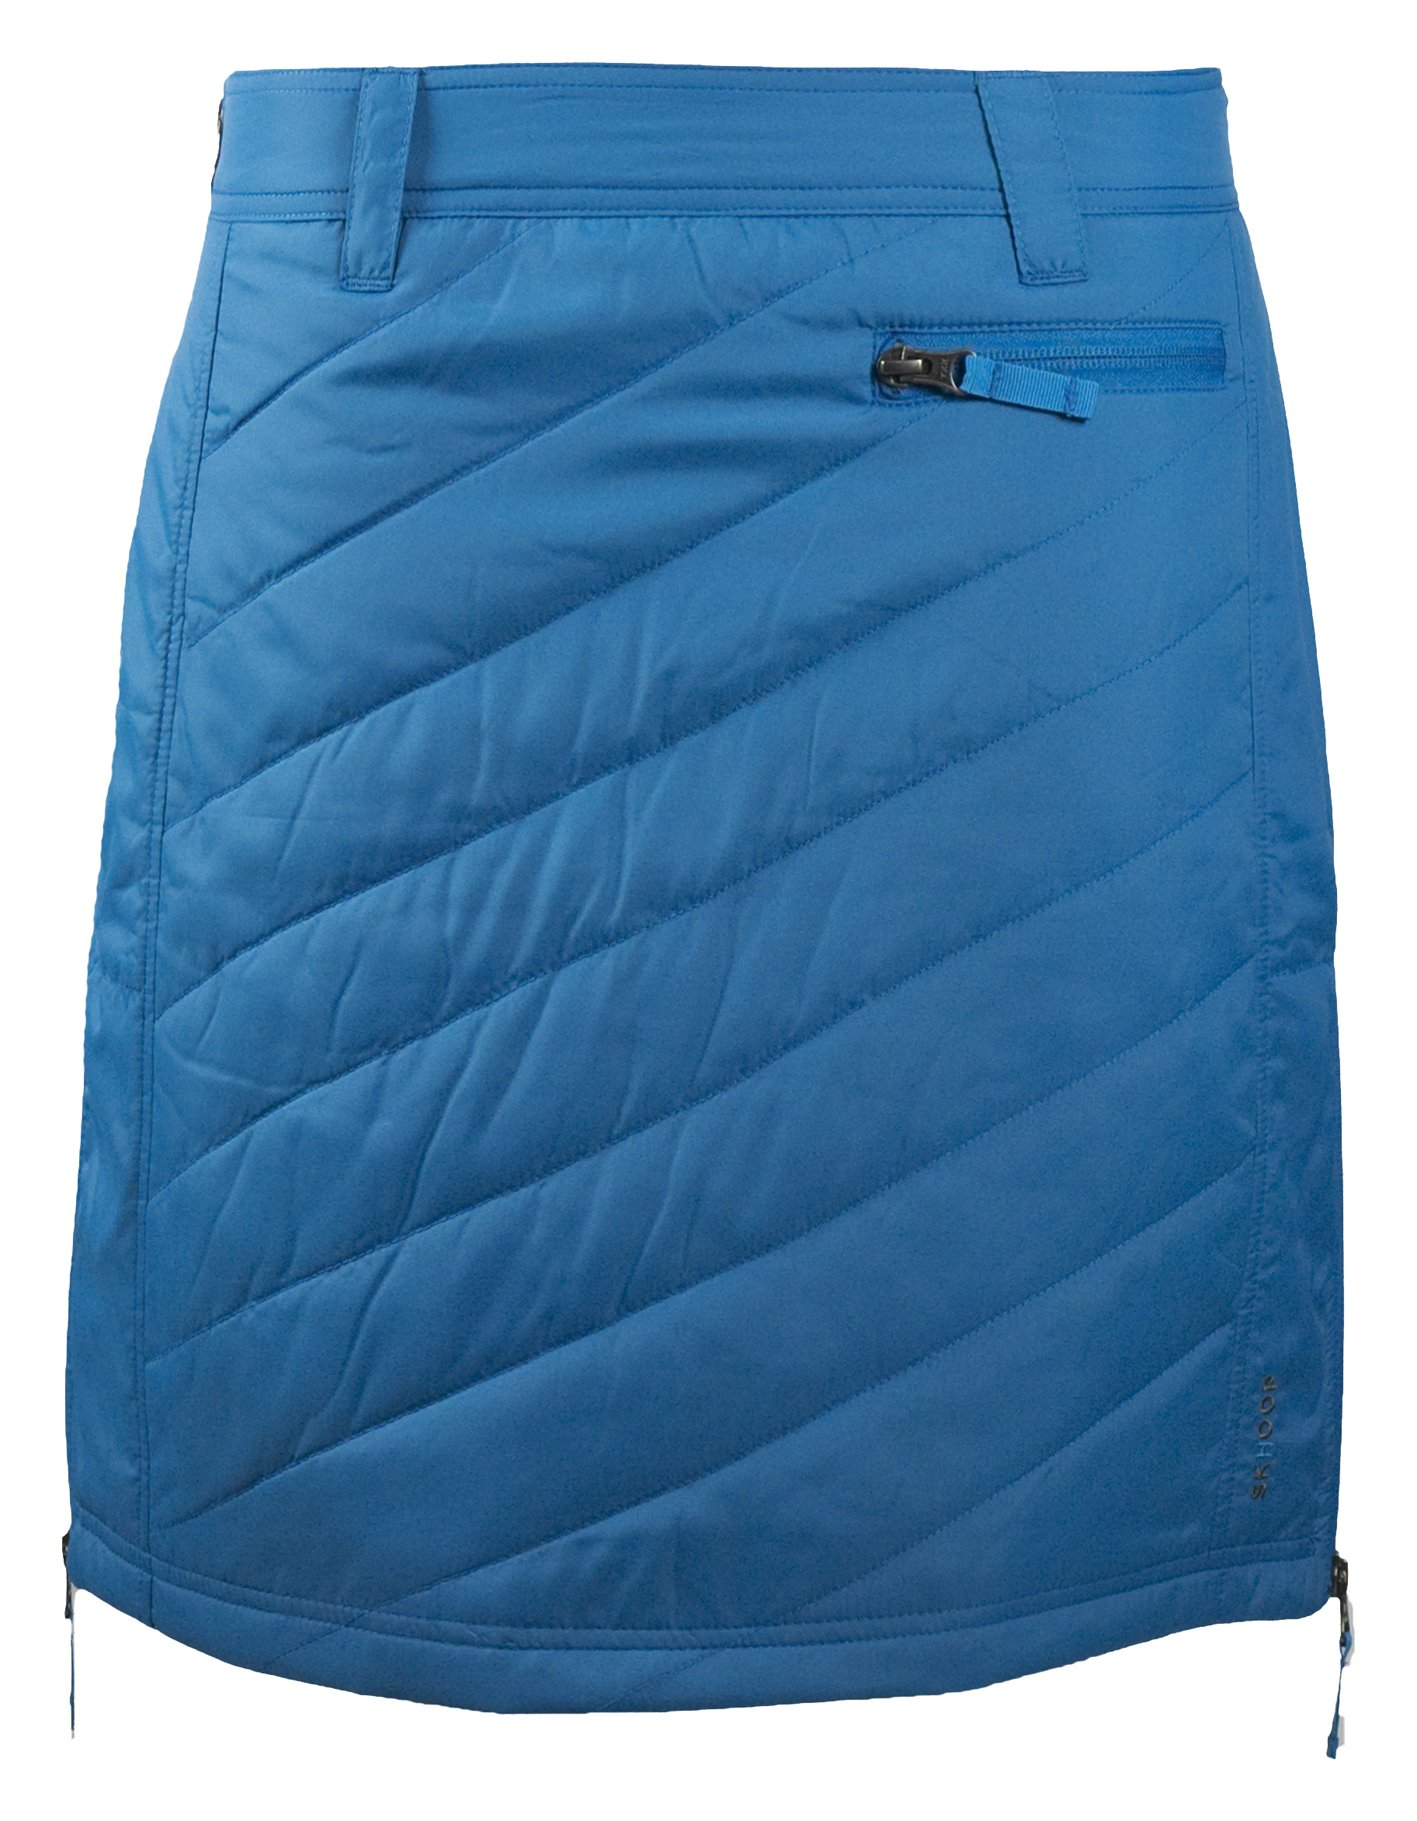 Skhoop Sandy Short Skirt, Methyl Blue, Medium